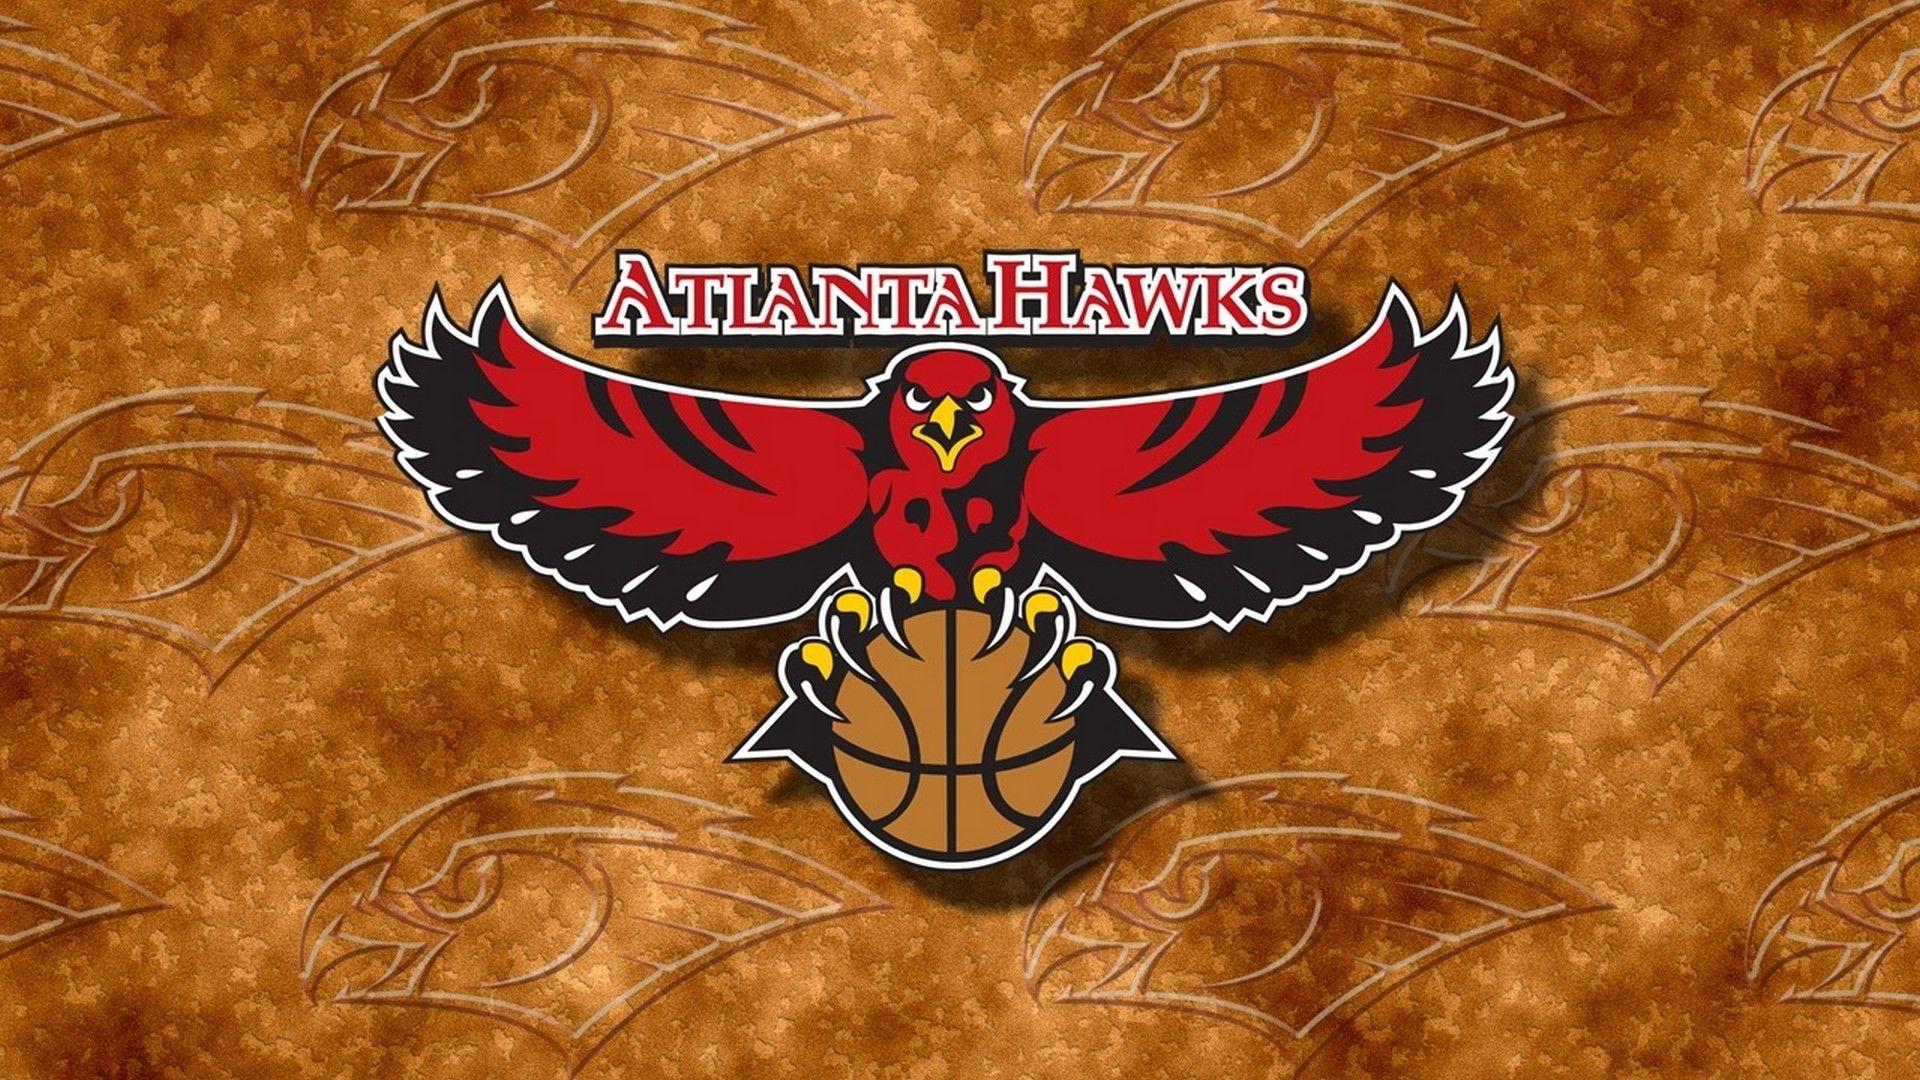 Hd Atlanta Hawks Wallpapers 2021 Basketball Wallpaper Hawks Wallpapers Atlanta Hawks Wallpaper Basketball Wallpaper